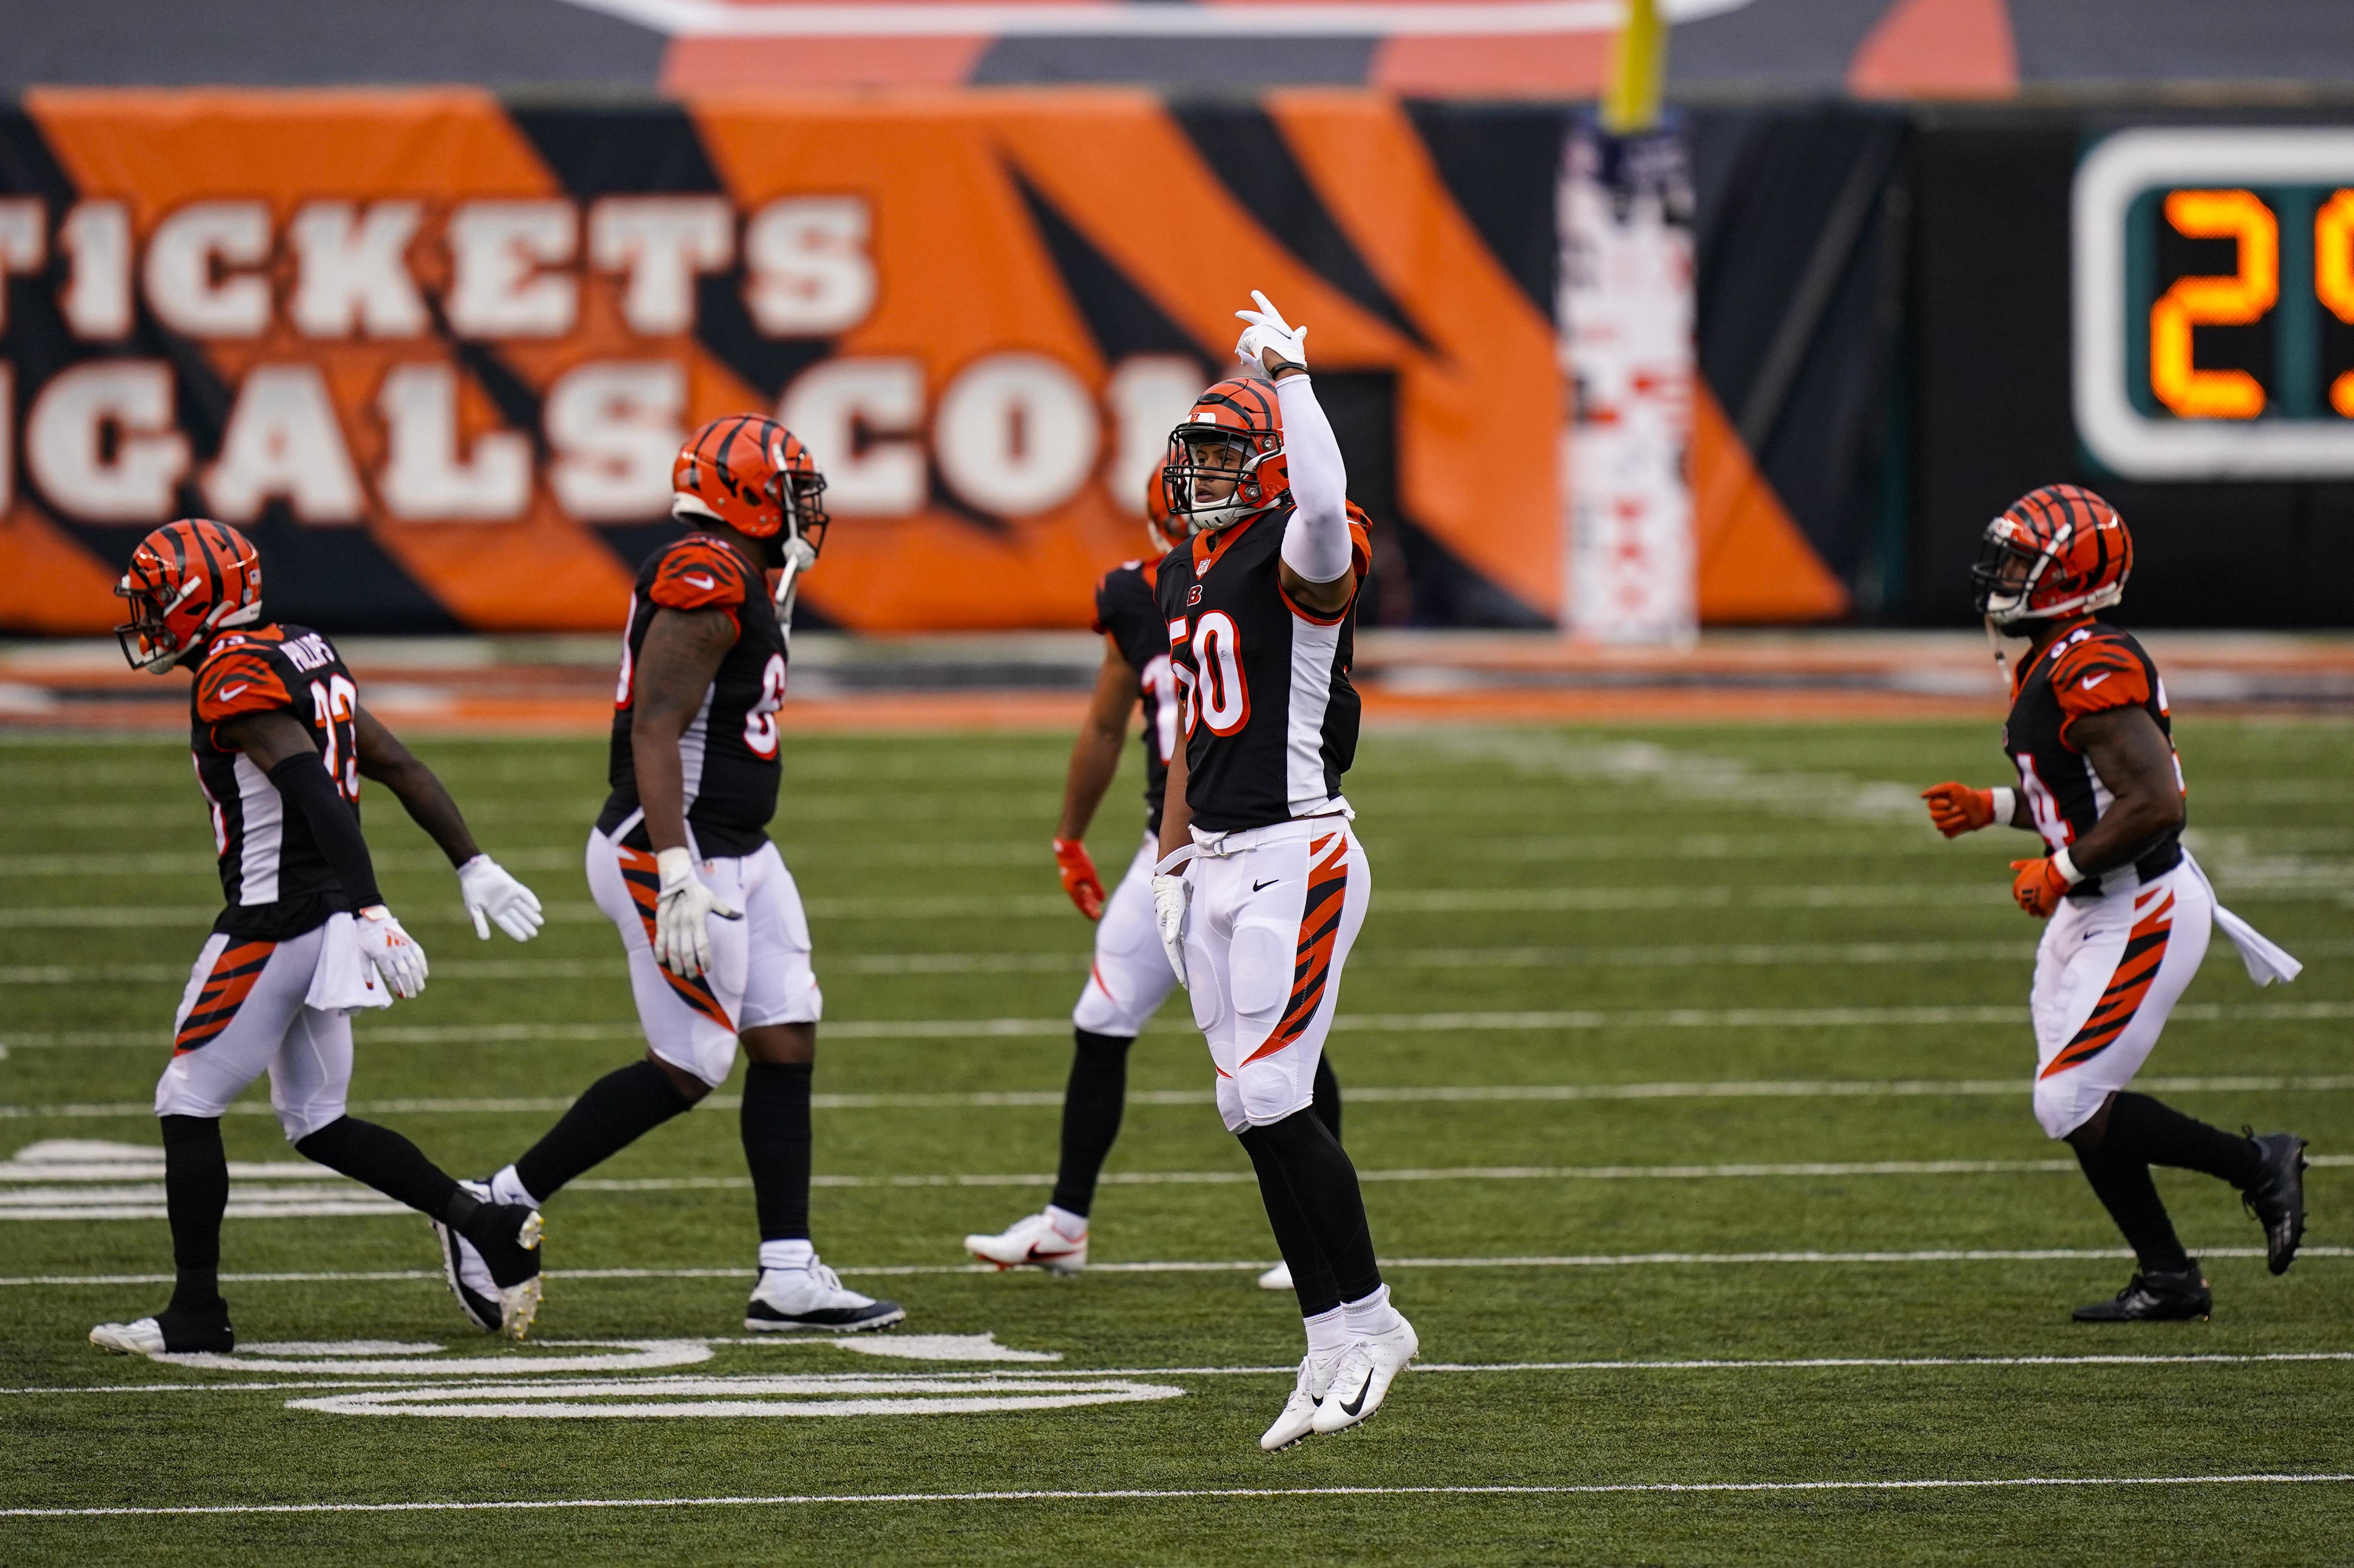 Mixon's 3 TDs pace Bengals in 33-25 win over Jaguars | KRQE News 13